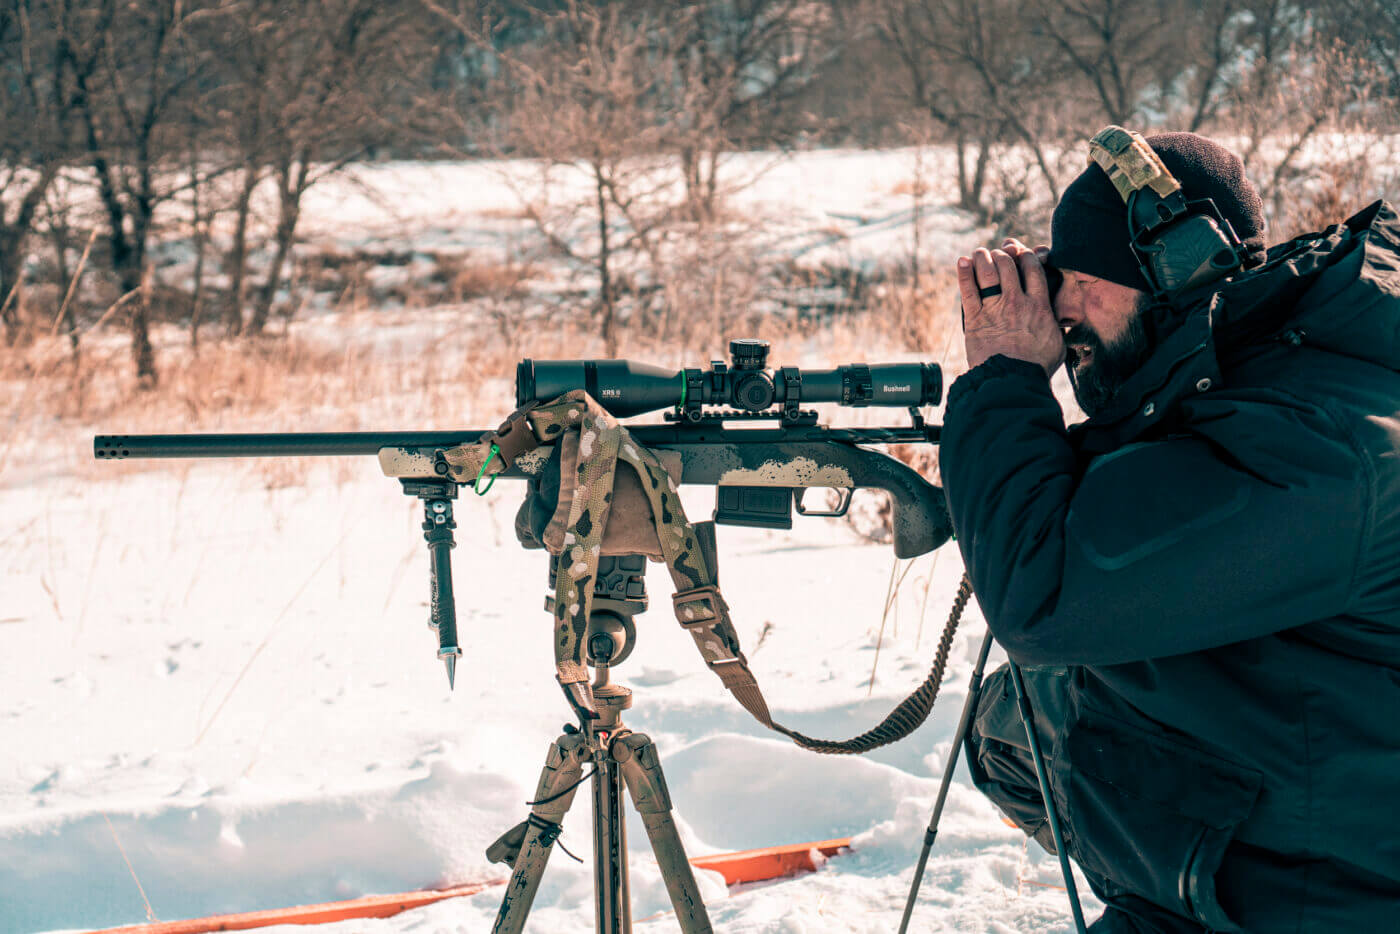 Predator hunting with a rifle on a tripod